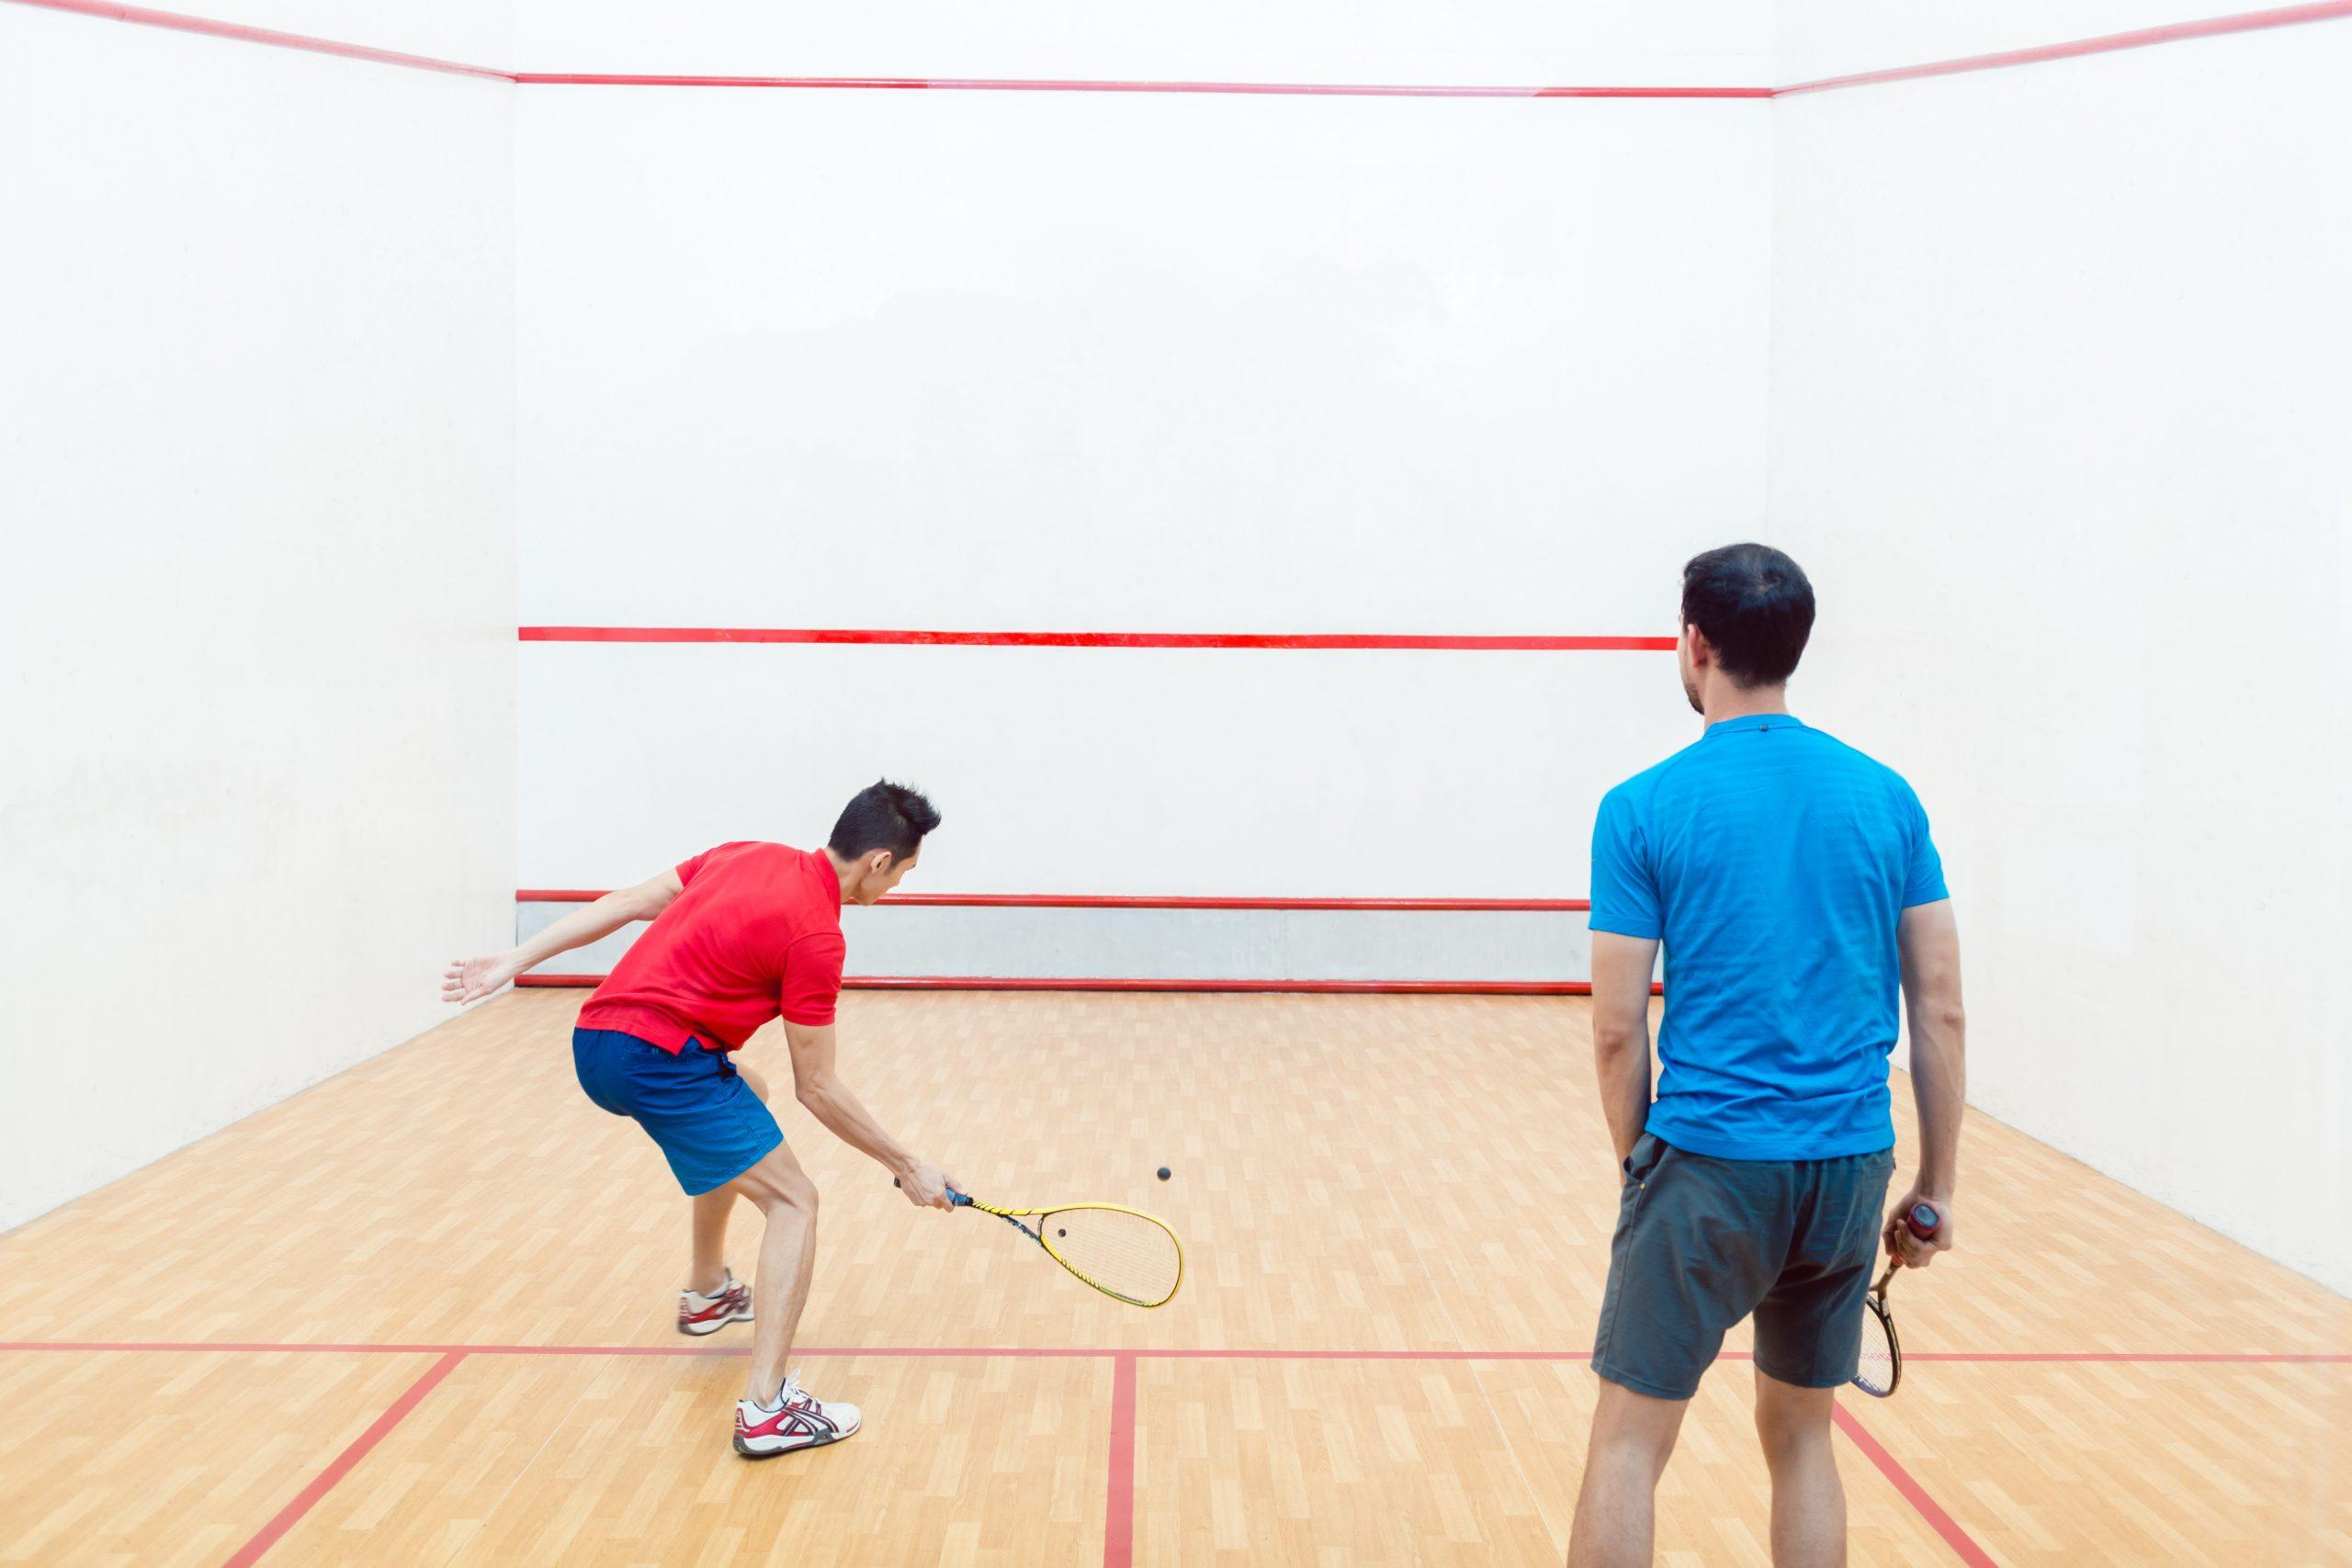 Šport Squash